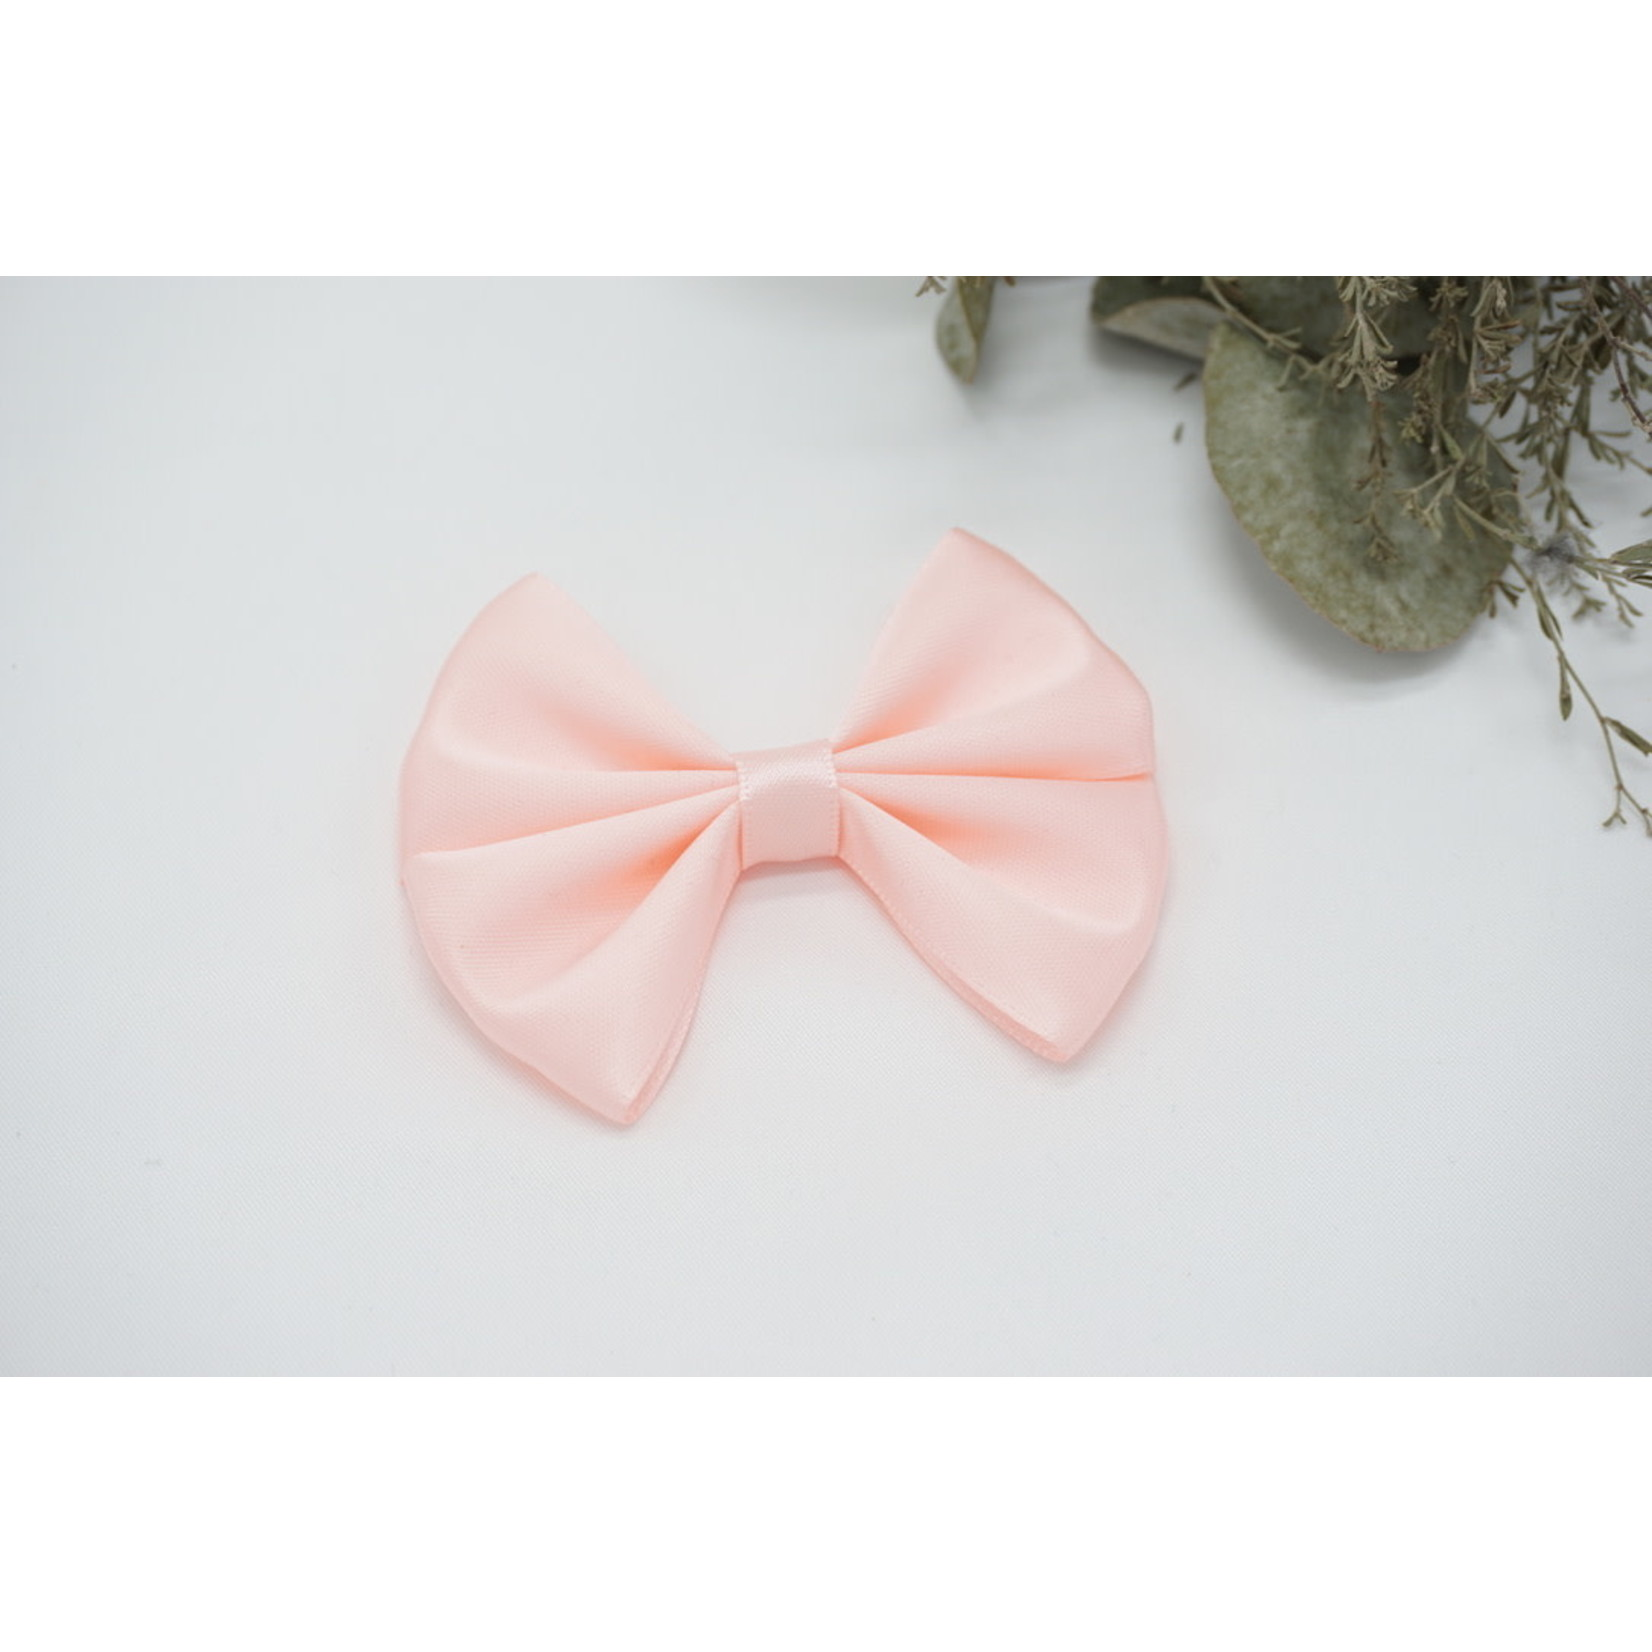 Petite Zara Satin Bow - Light Pink